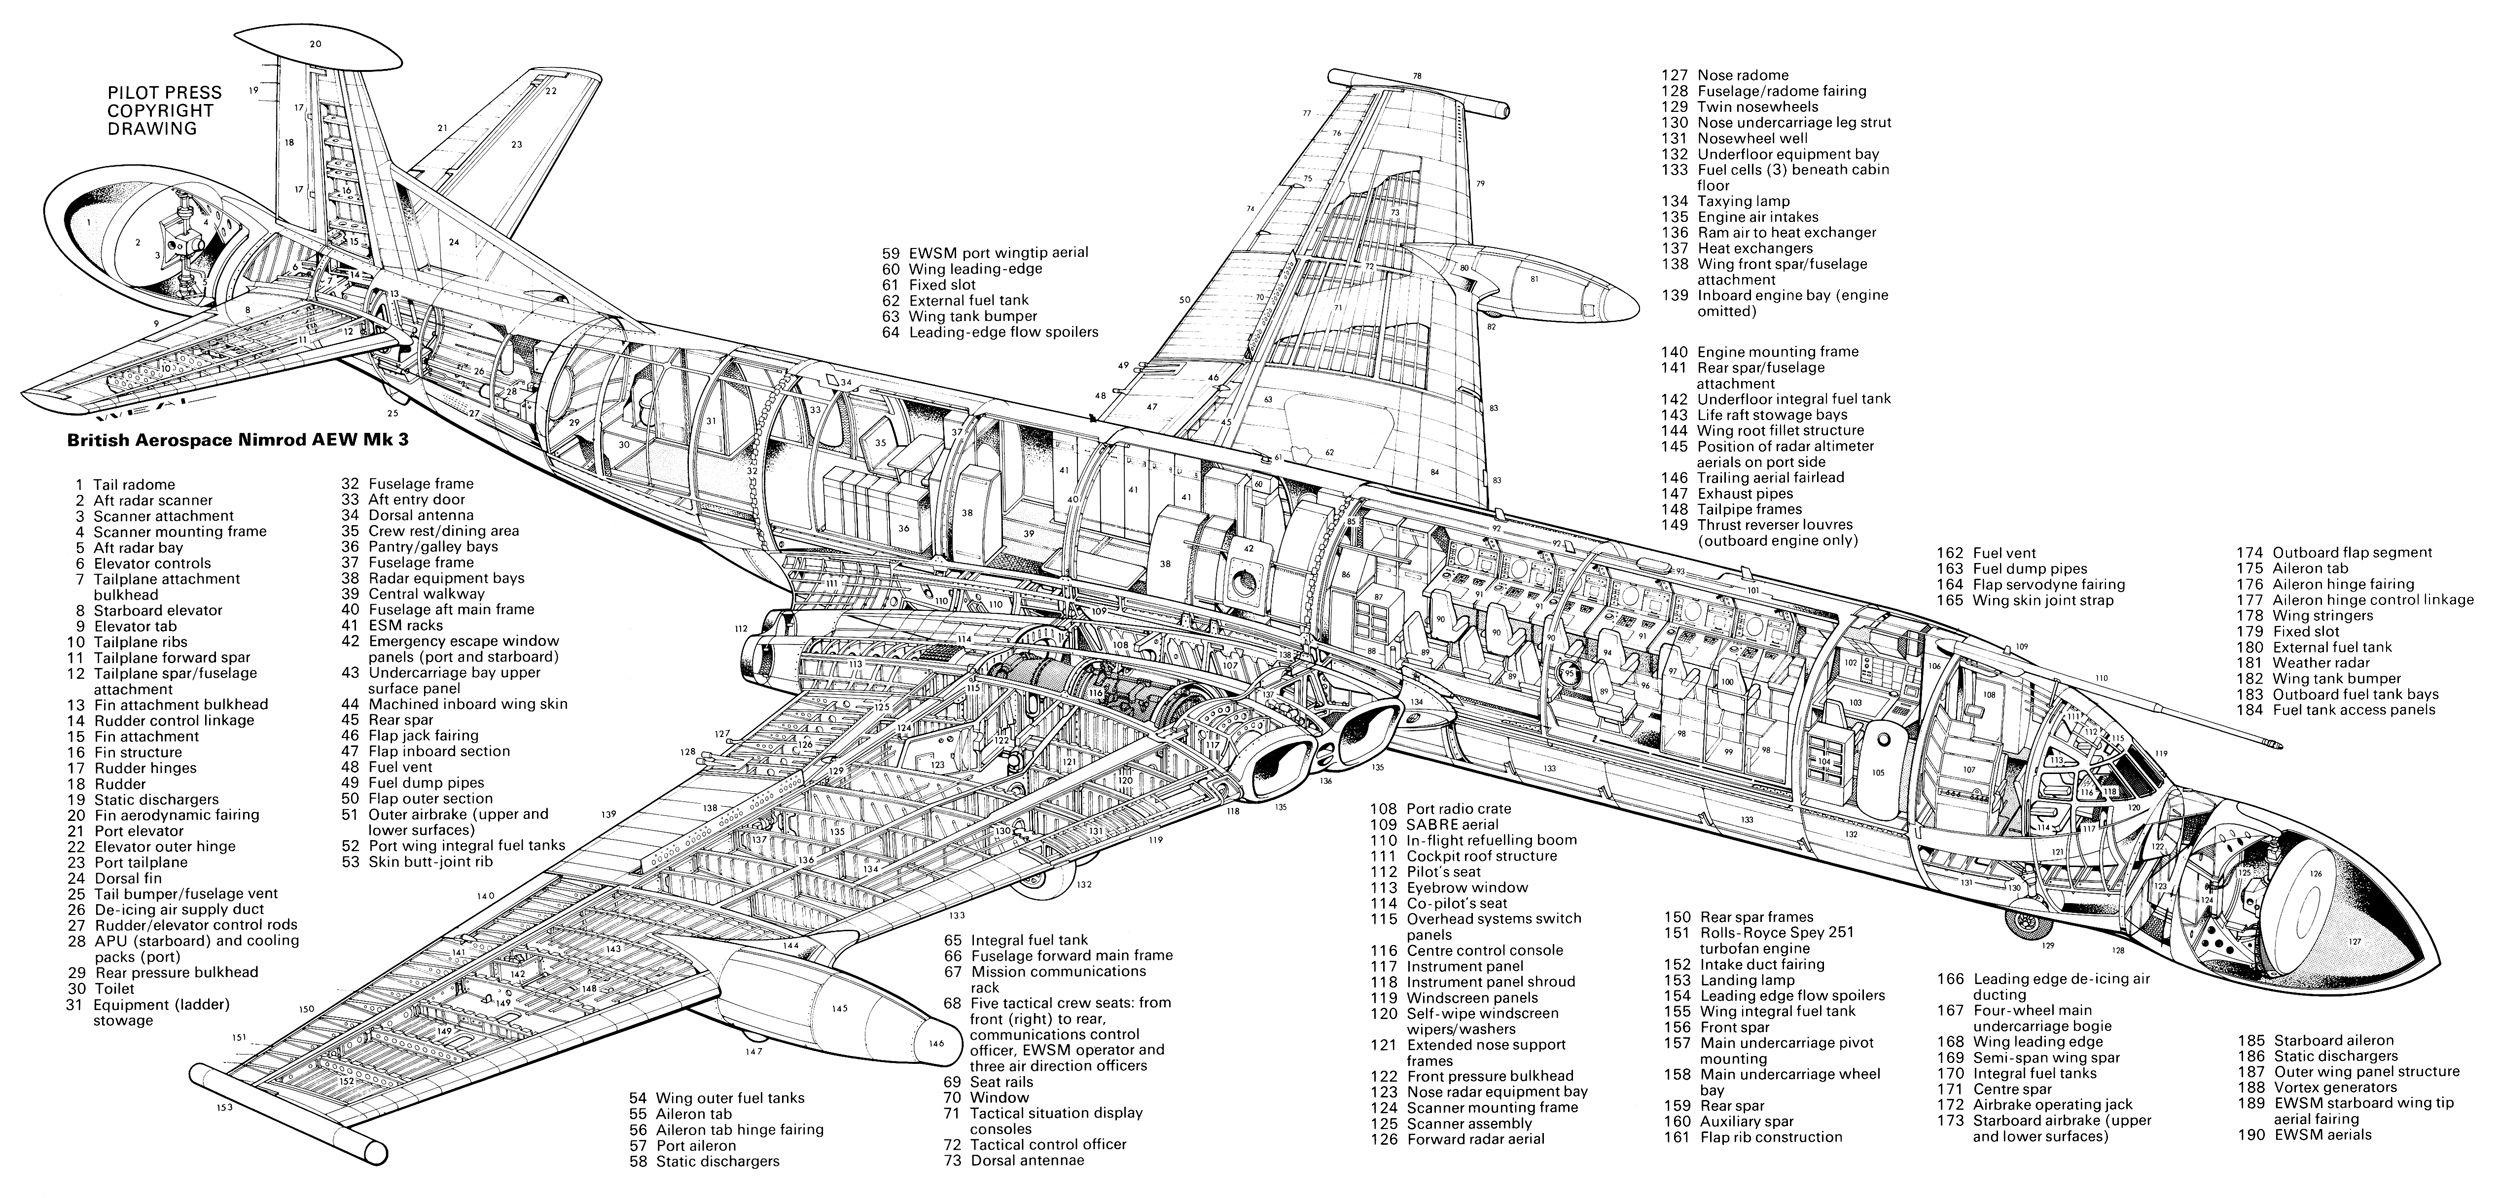 British Aerospace Nimrod Aew Mk 3